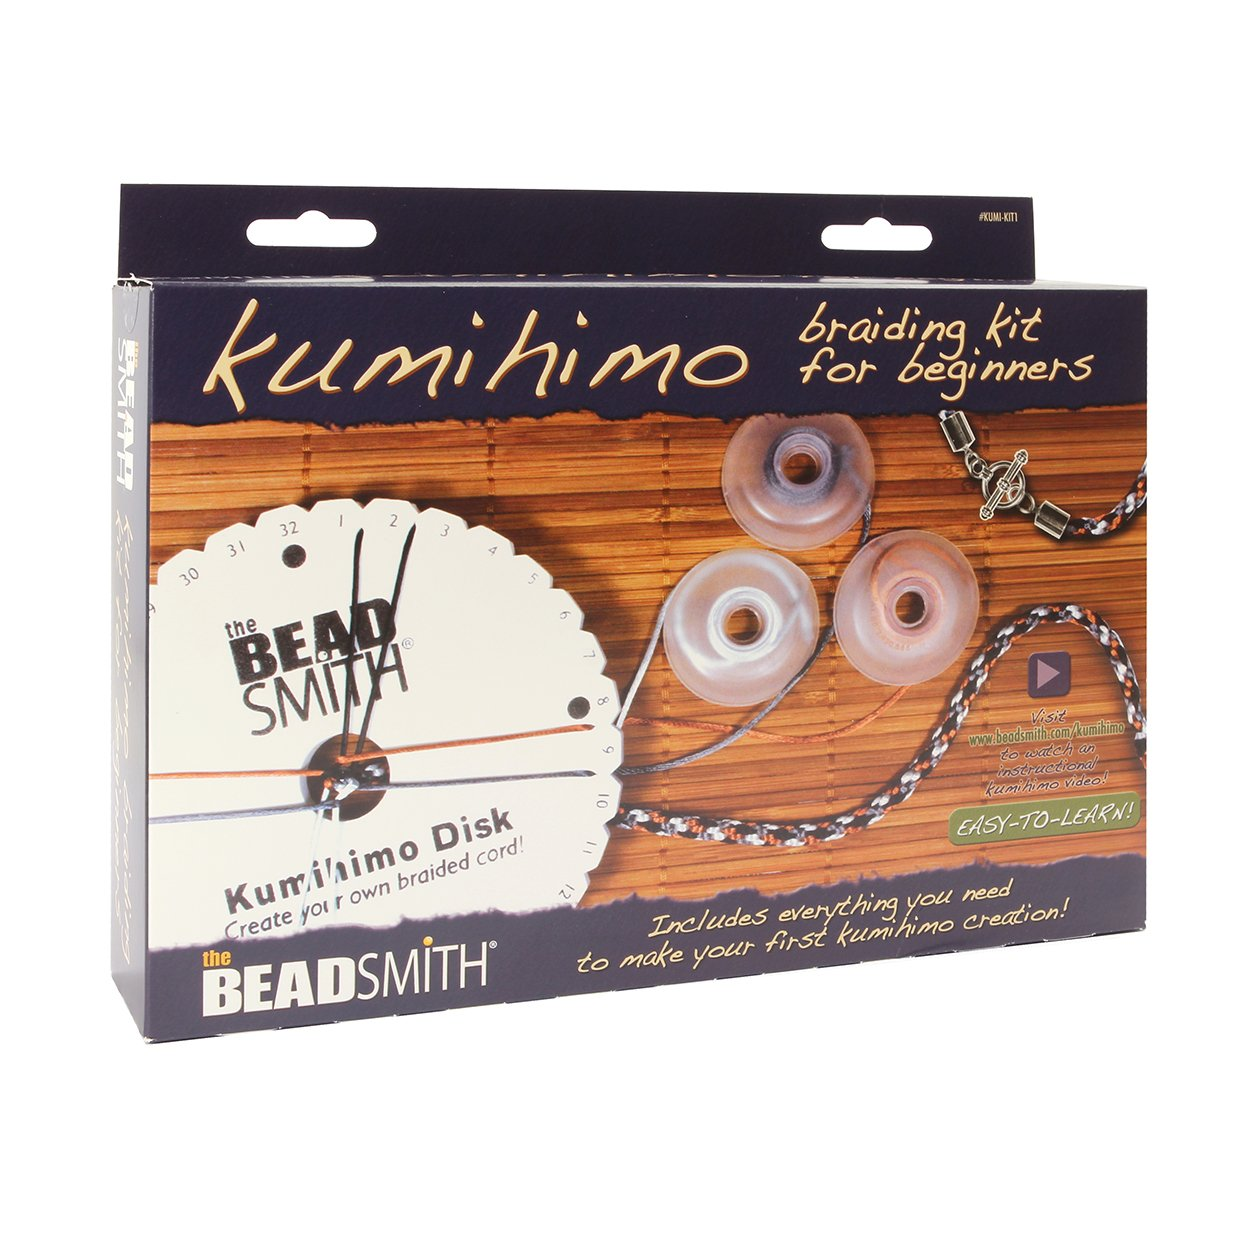 Beadsmith Kumihimo Starter Kit, Other, Multi, 25 x 19 x 5 cm 5060525970542